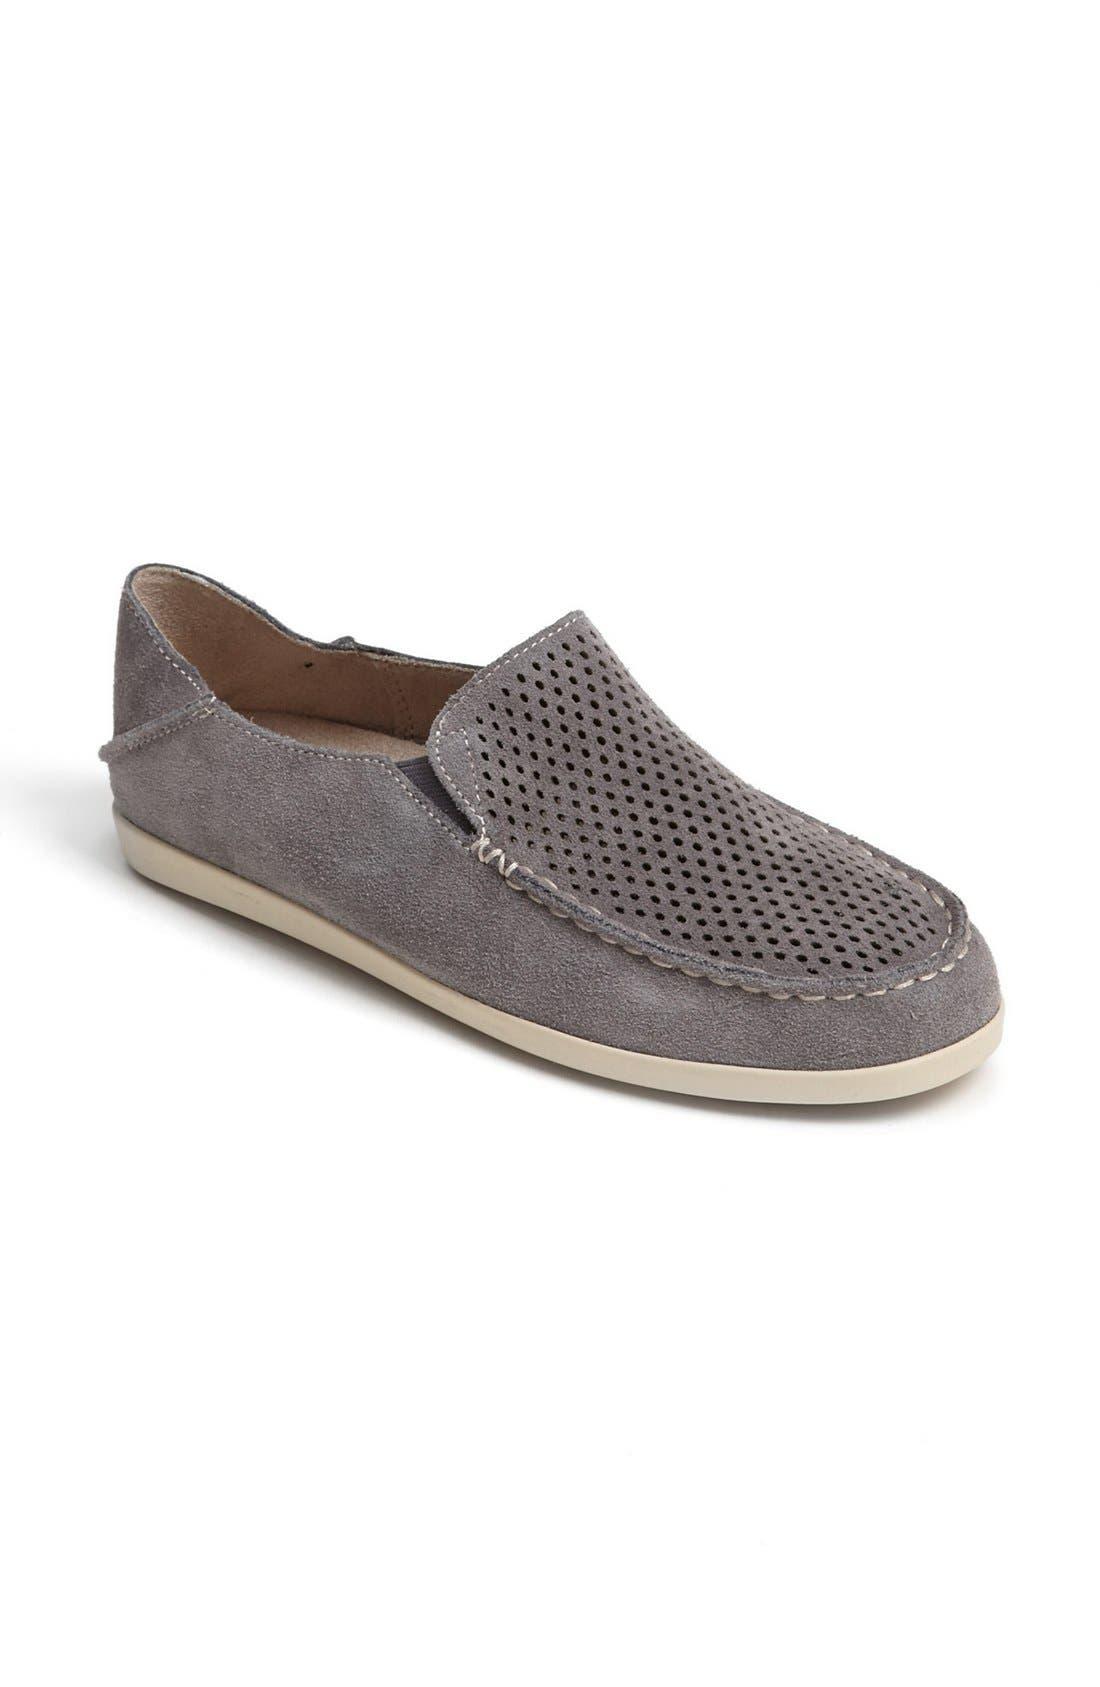 Alternate Image 1 Selected - OluKai 'Nohea' Sneaker